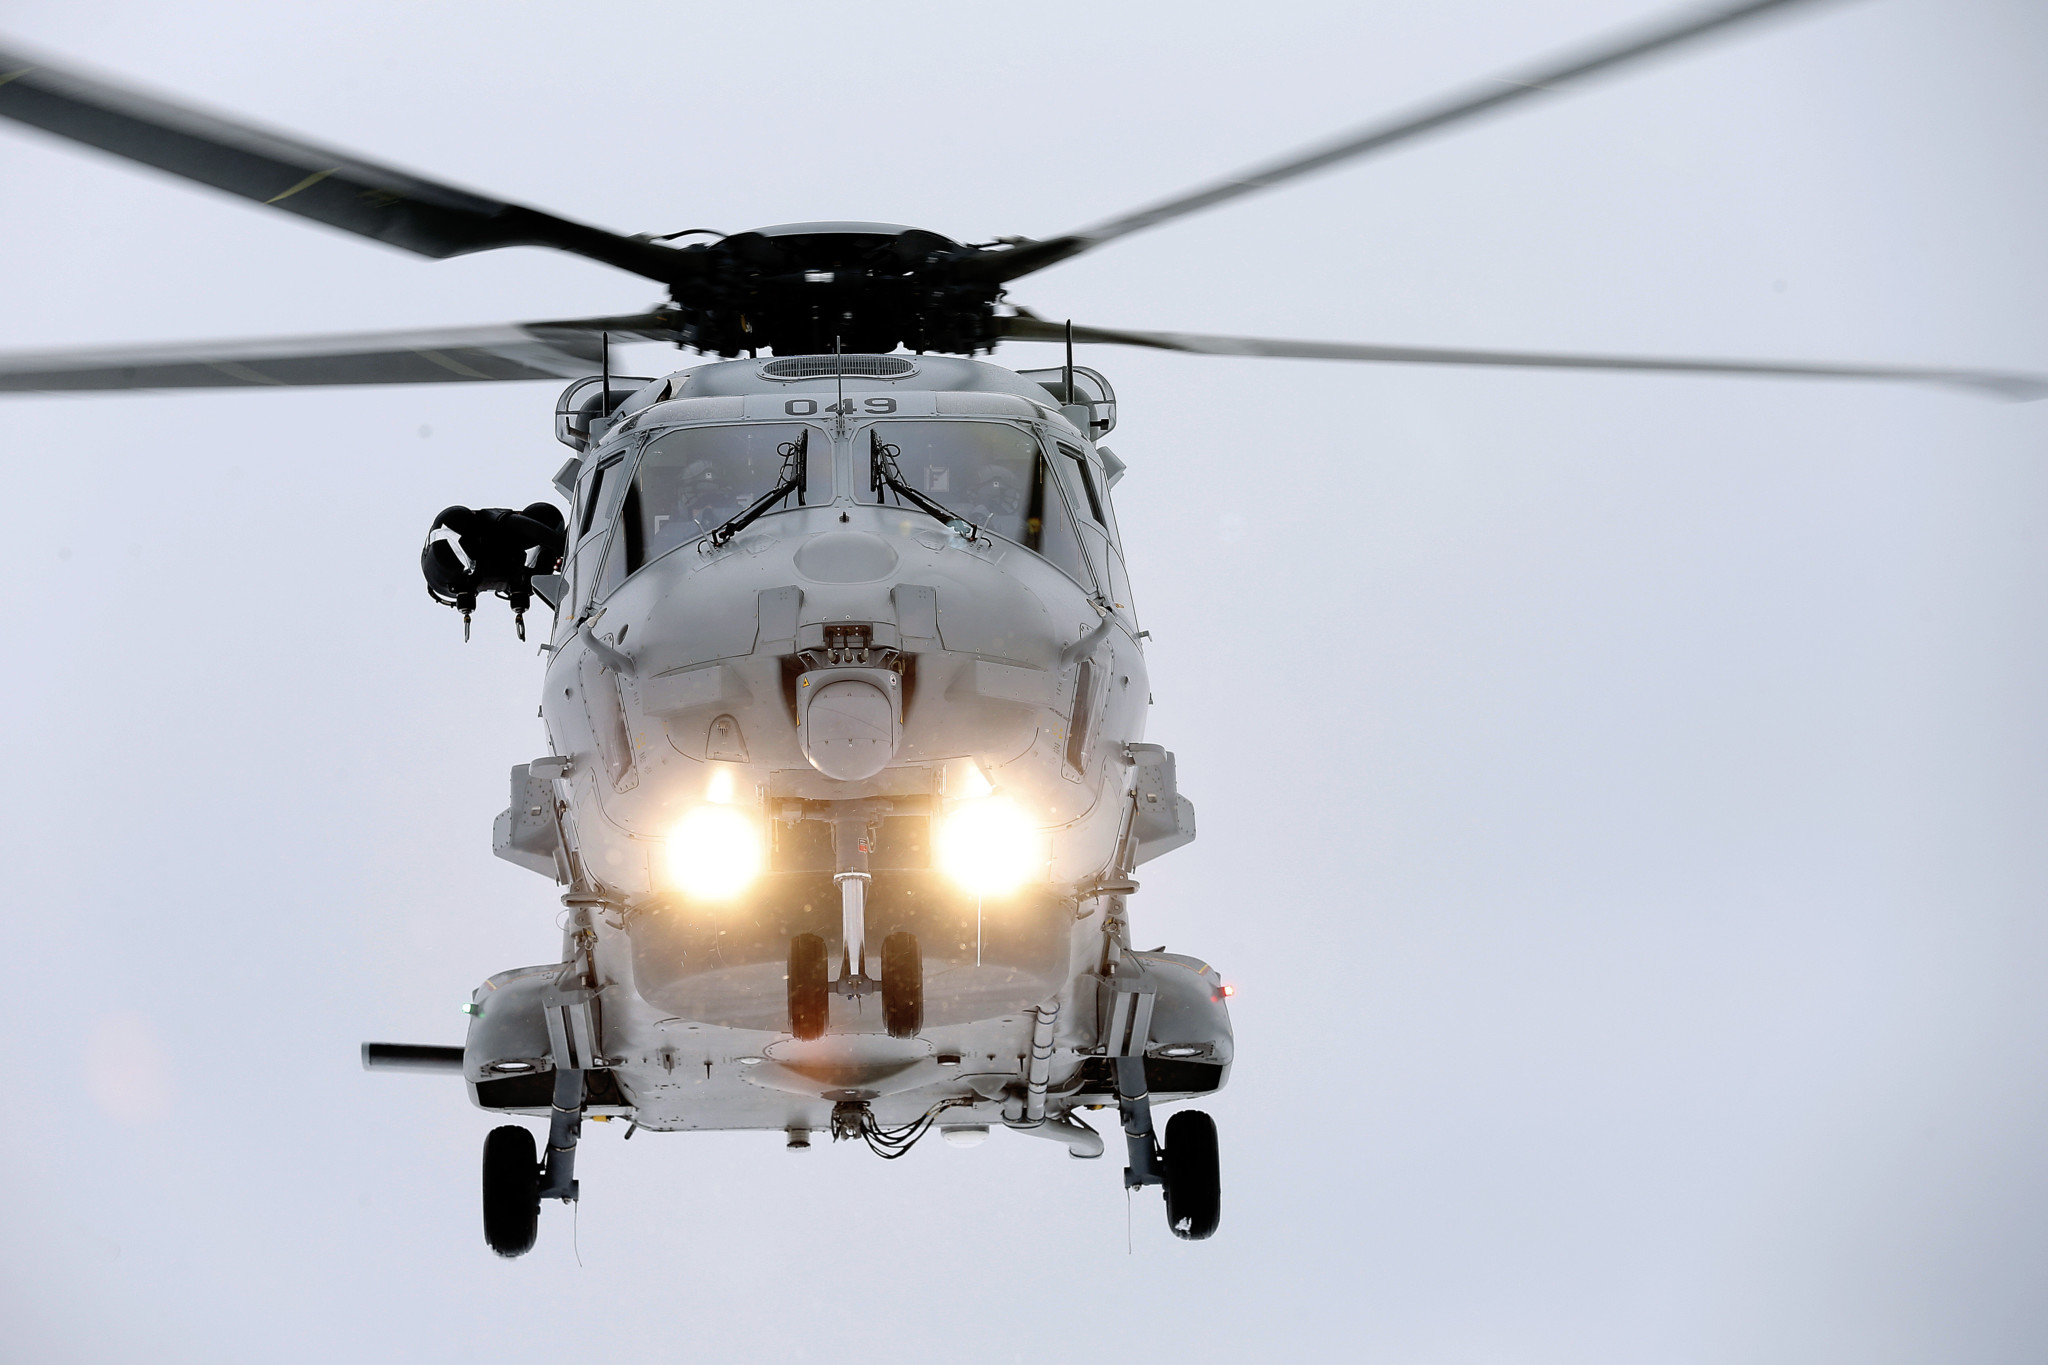 Det maritime helikopteret NH90 under testing på Bardufoss flystasjon under vinterøvelsen Cold Response 2014 / The maritime helicopter NH90 due to testing at Bardufoss airstation during the winter exercise Cold Response 2014